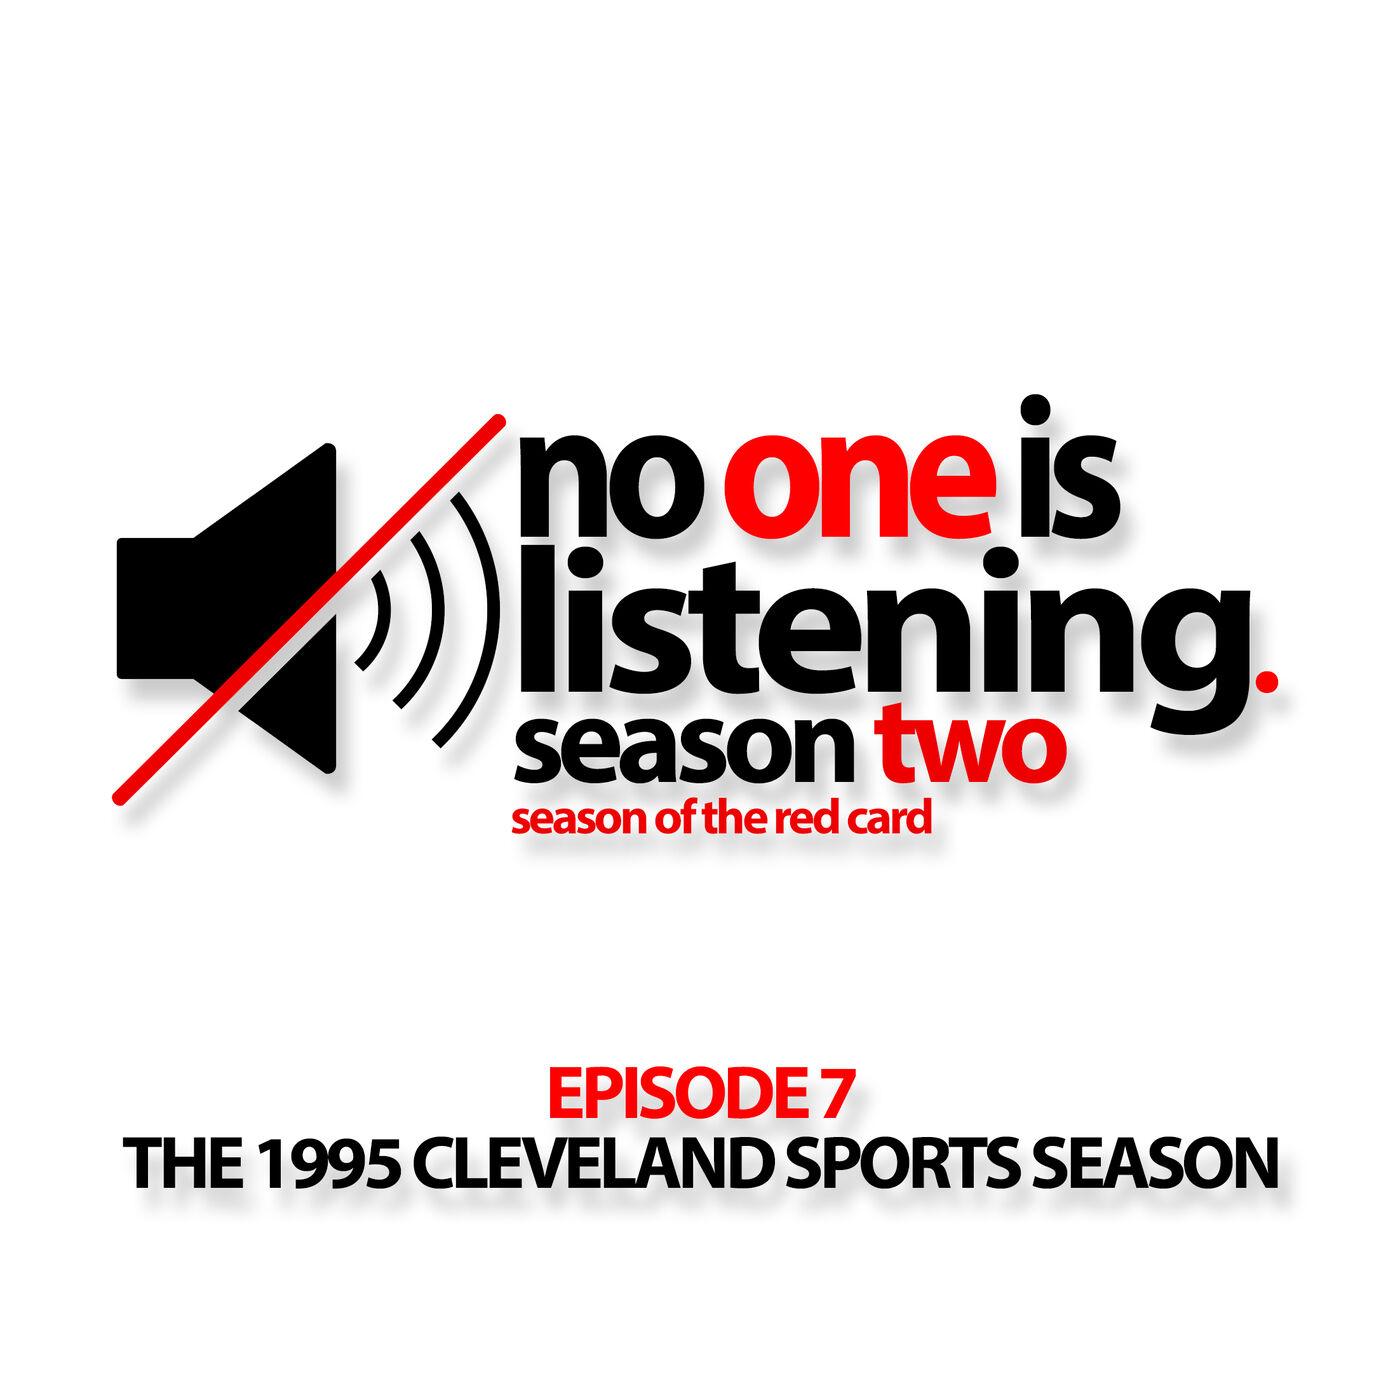 S2E7 The 1995 Cleveland Sports Season